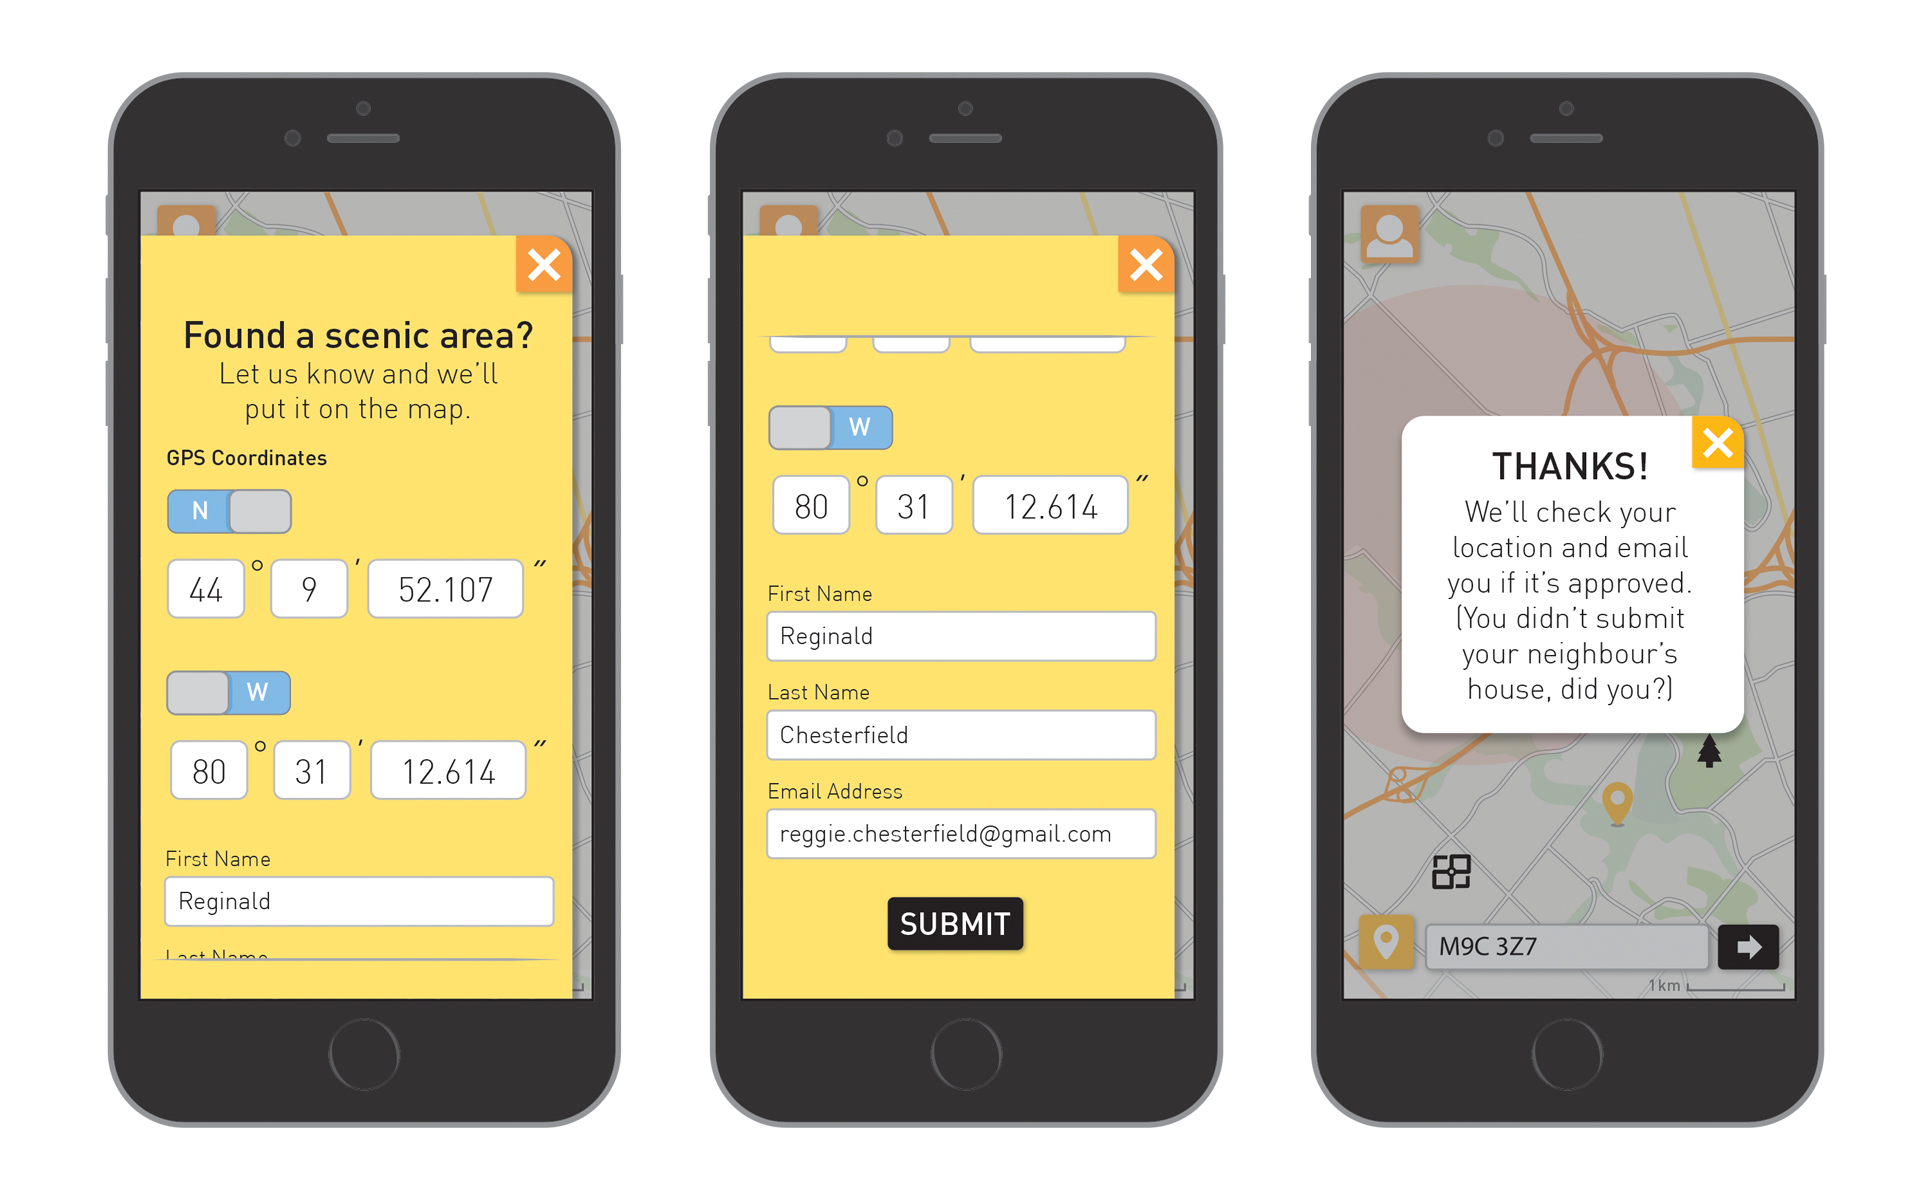 drone pro app screens 4